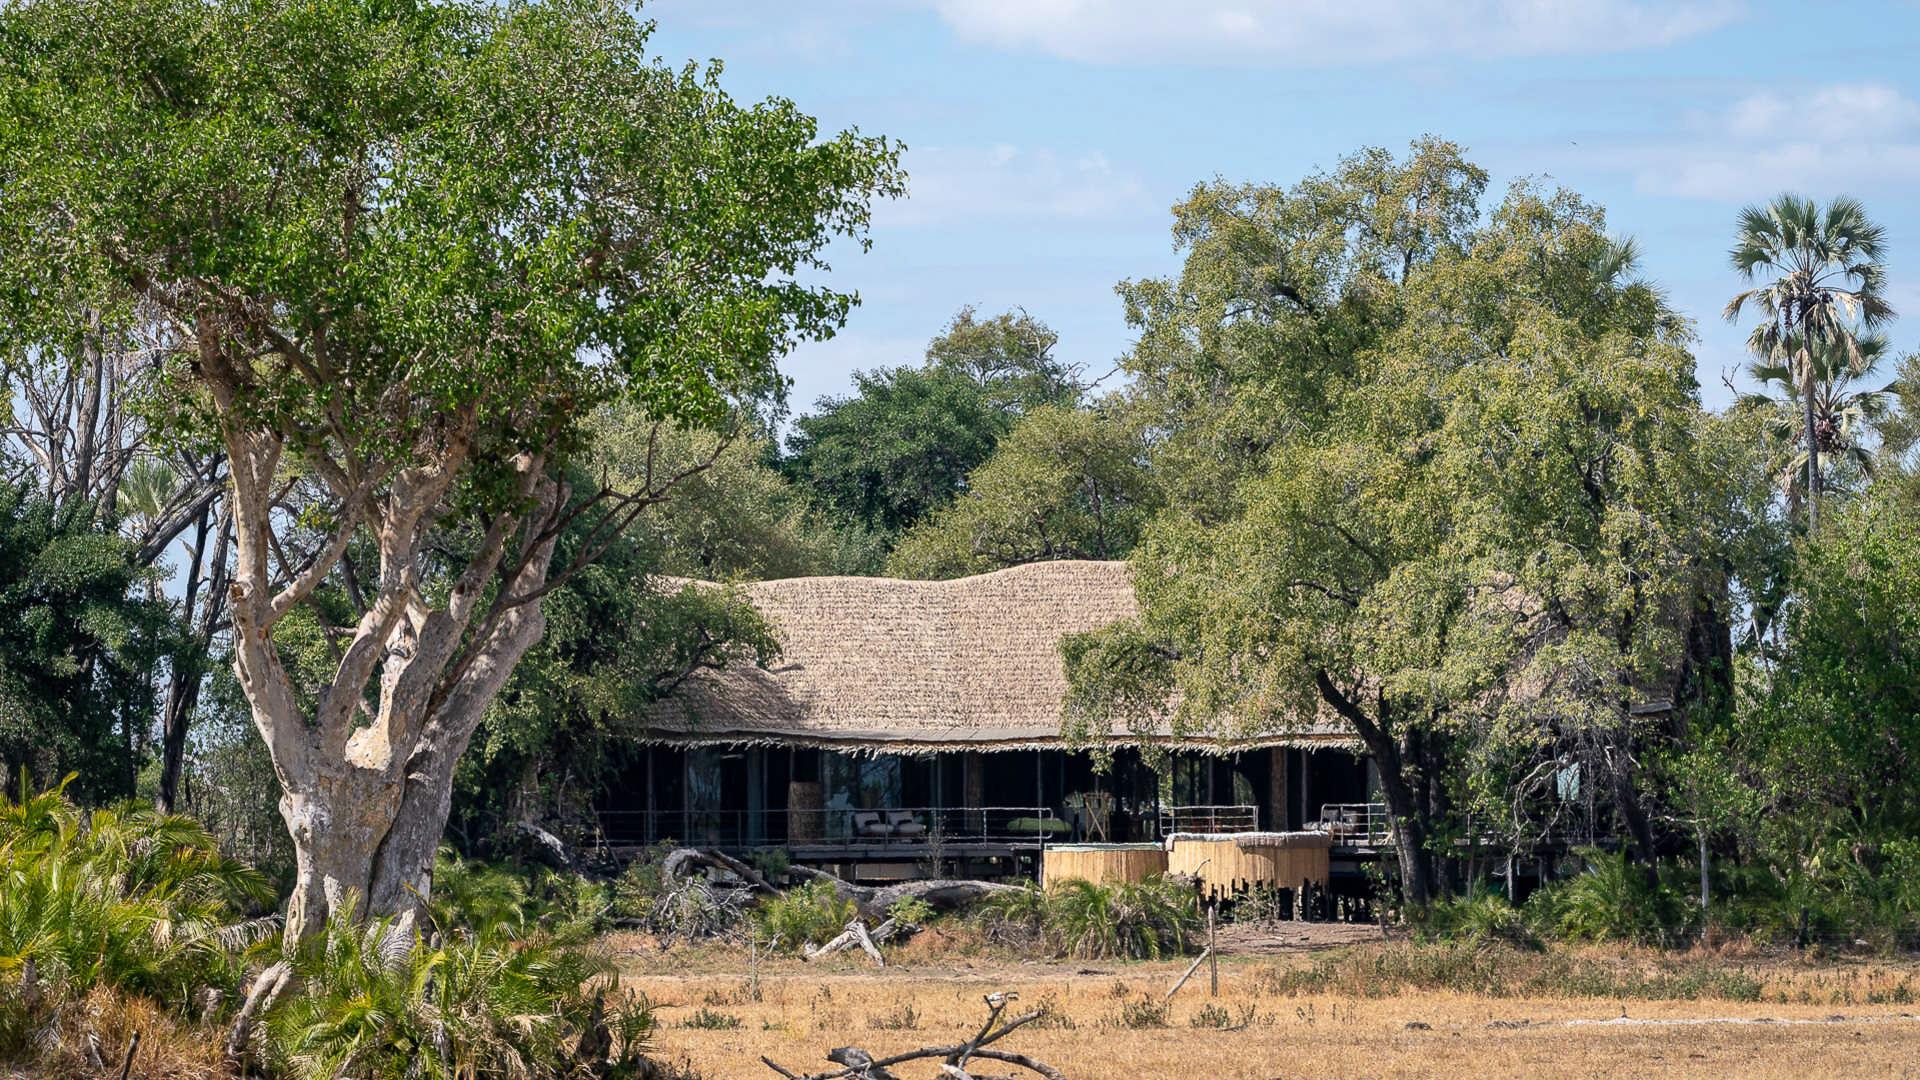 Jao-Camp-Okavango-Delta-Botswana-14